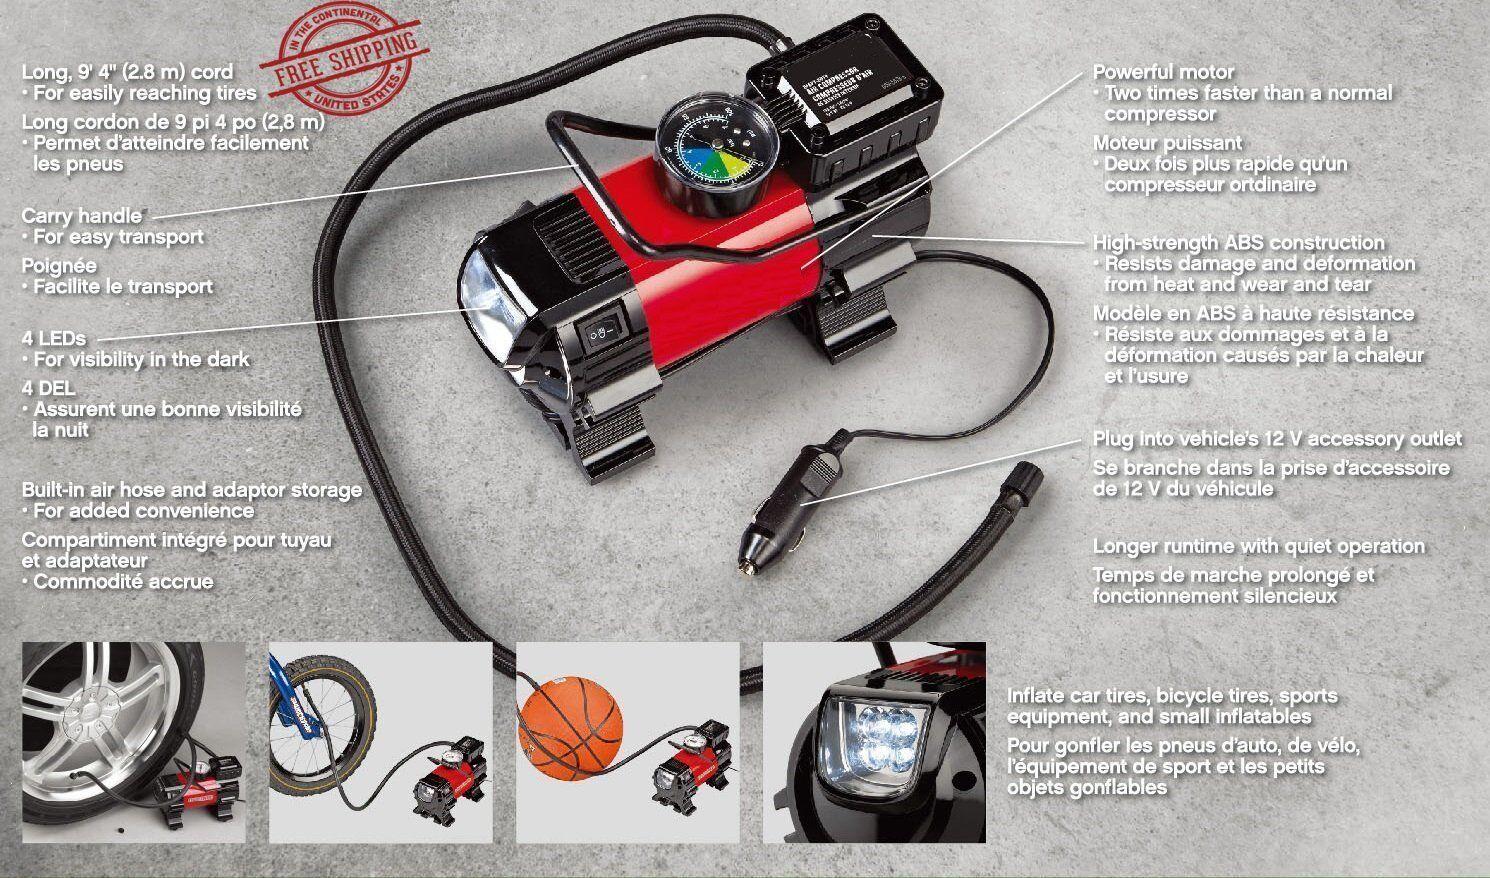 Air Compressor LED Car 12V Portable Pump Auto Tire Inflator